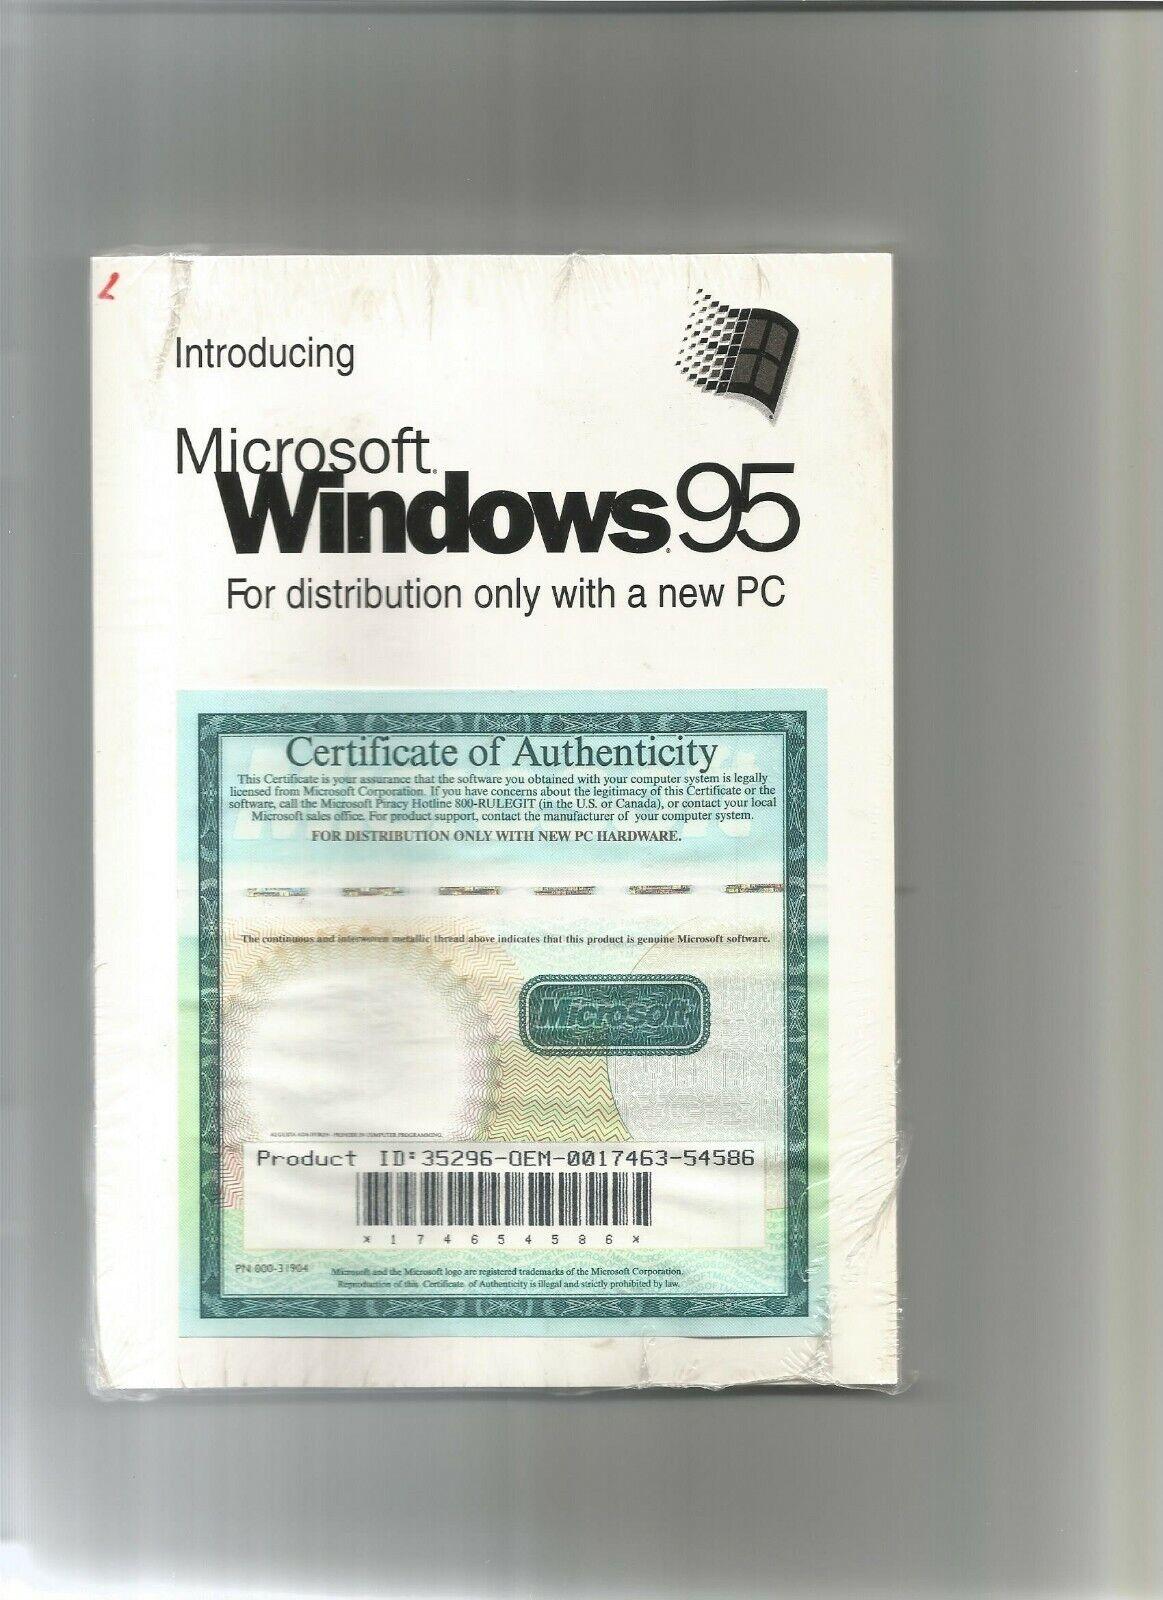 LIVRE : INTRODUCING MICROSOFT WINDOWS 95 en anglais   2